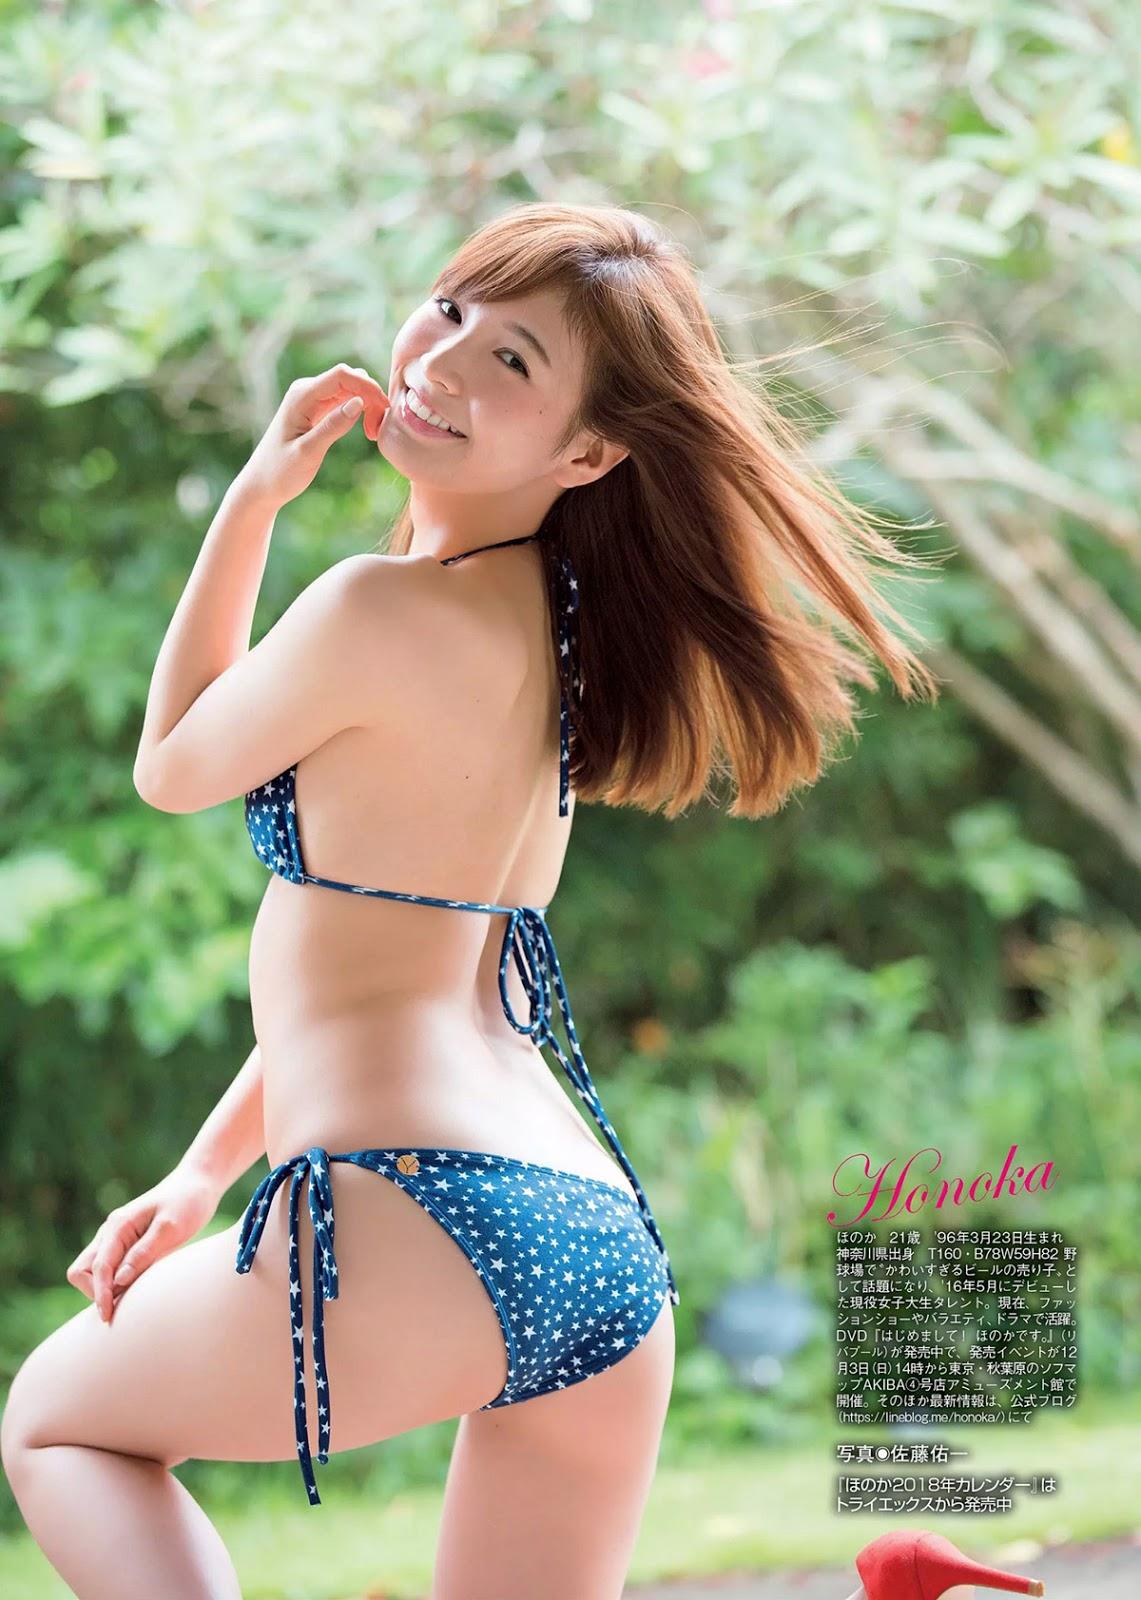 Honoka ほのか, FLASH 電子版 2017.12.12 No.1449 (フラッシュ 2017年12月12日号)